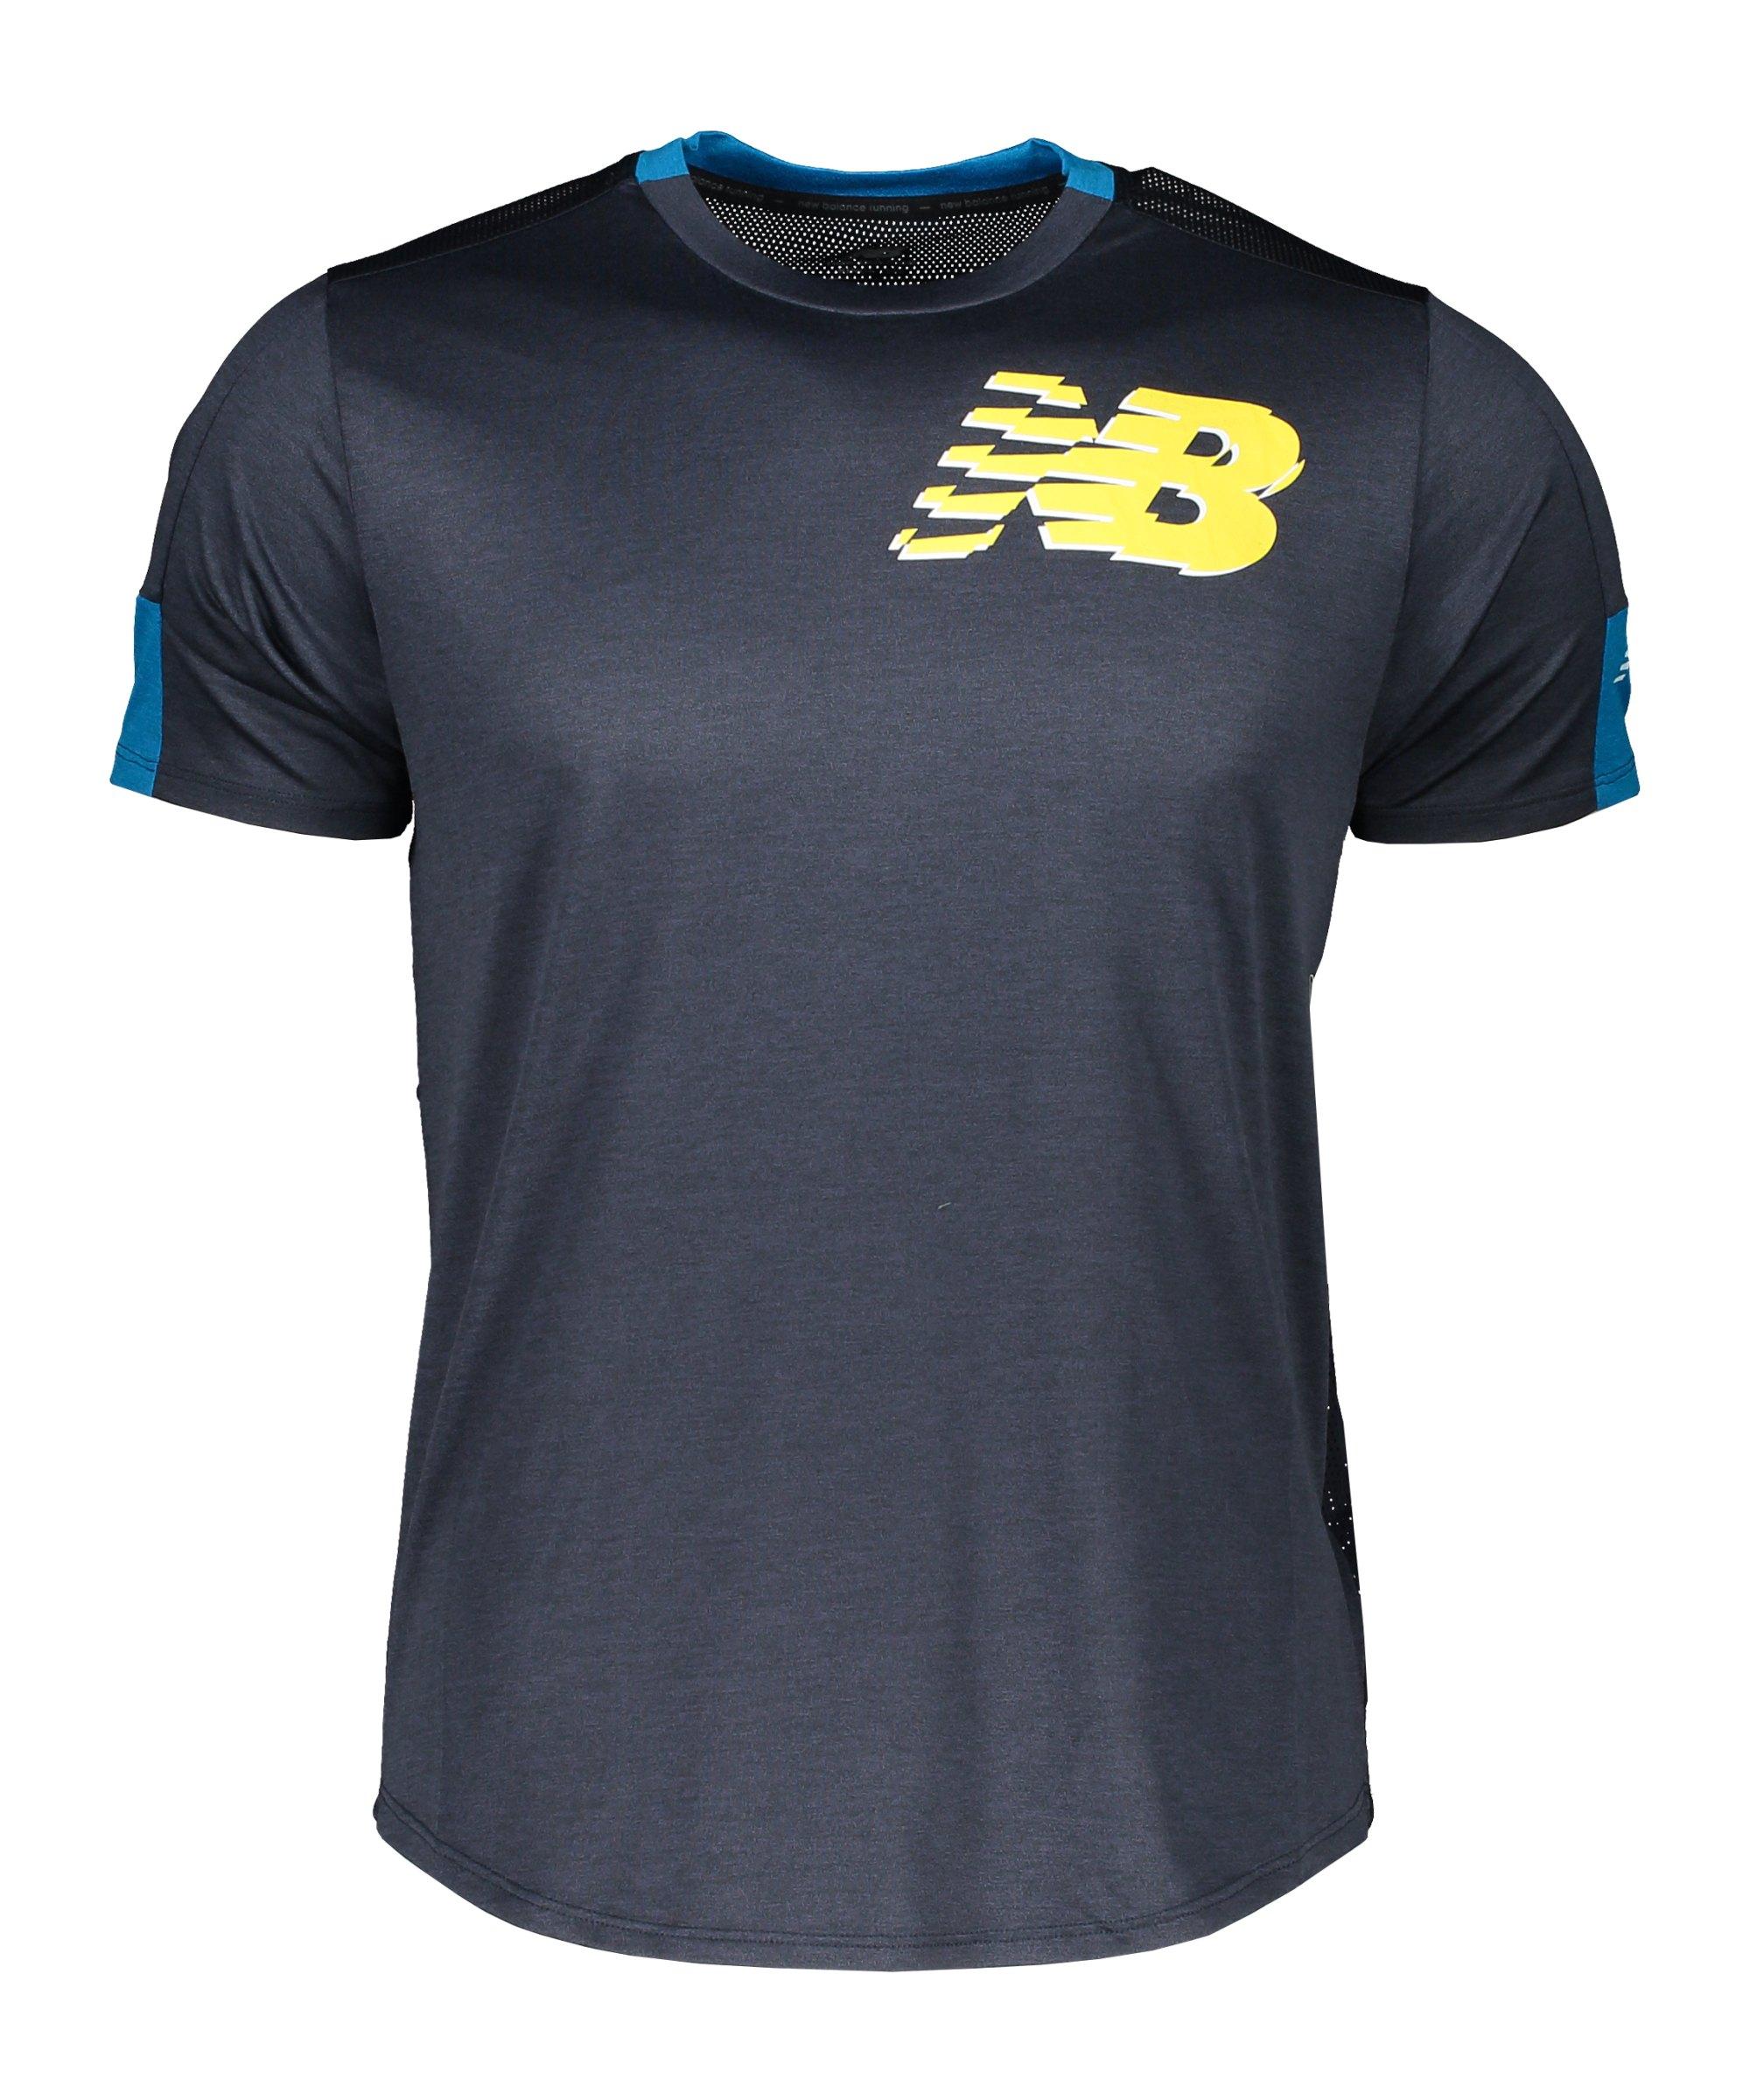 New Balance Printed Fast Flight T-Shirt FBYU - schwarz